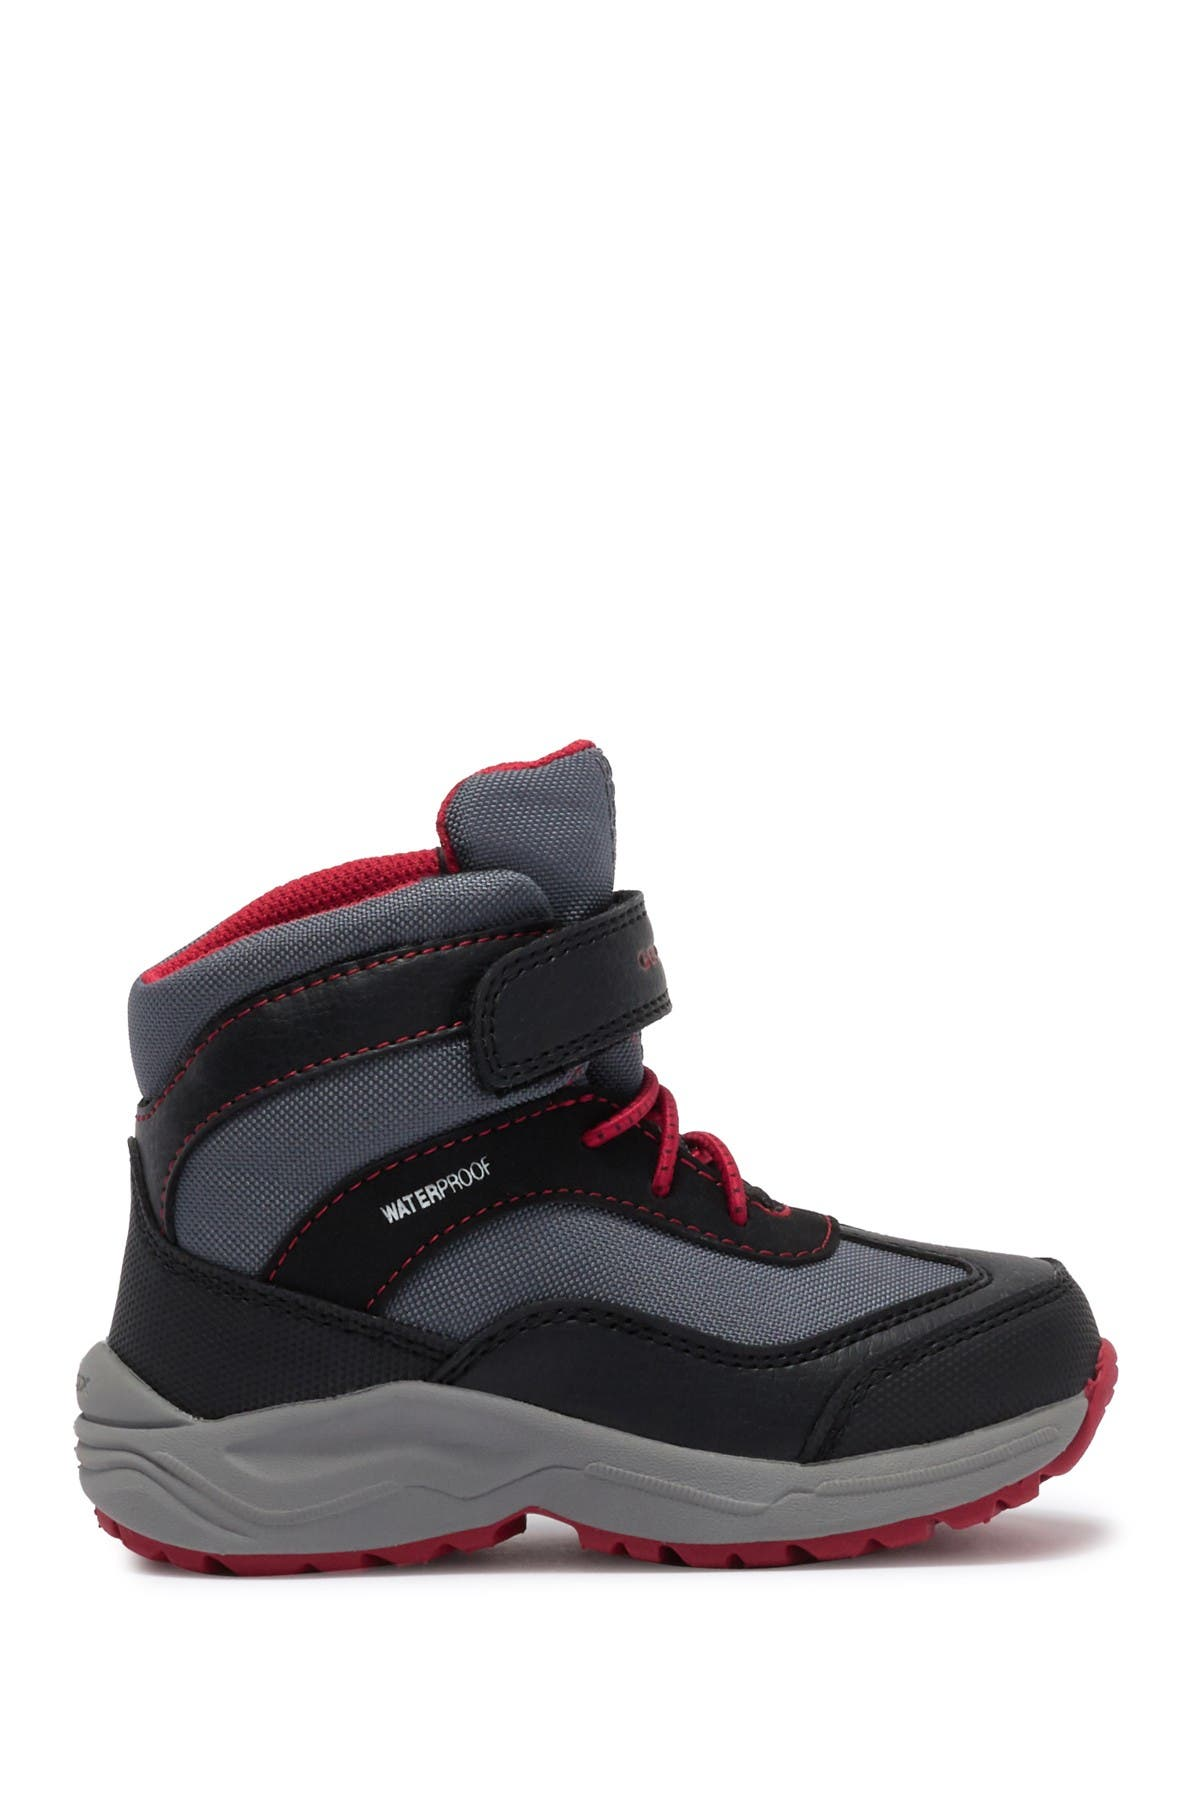 GEOX J Alaska Waterproof Boot